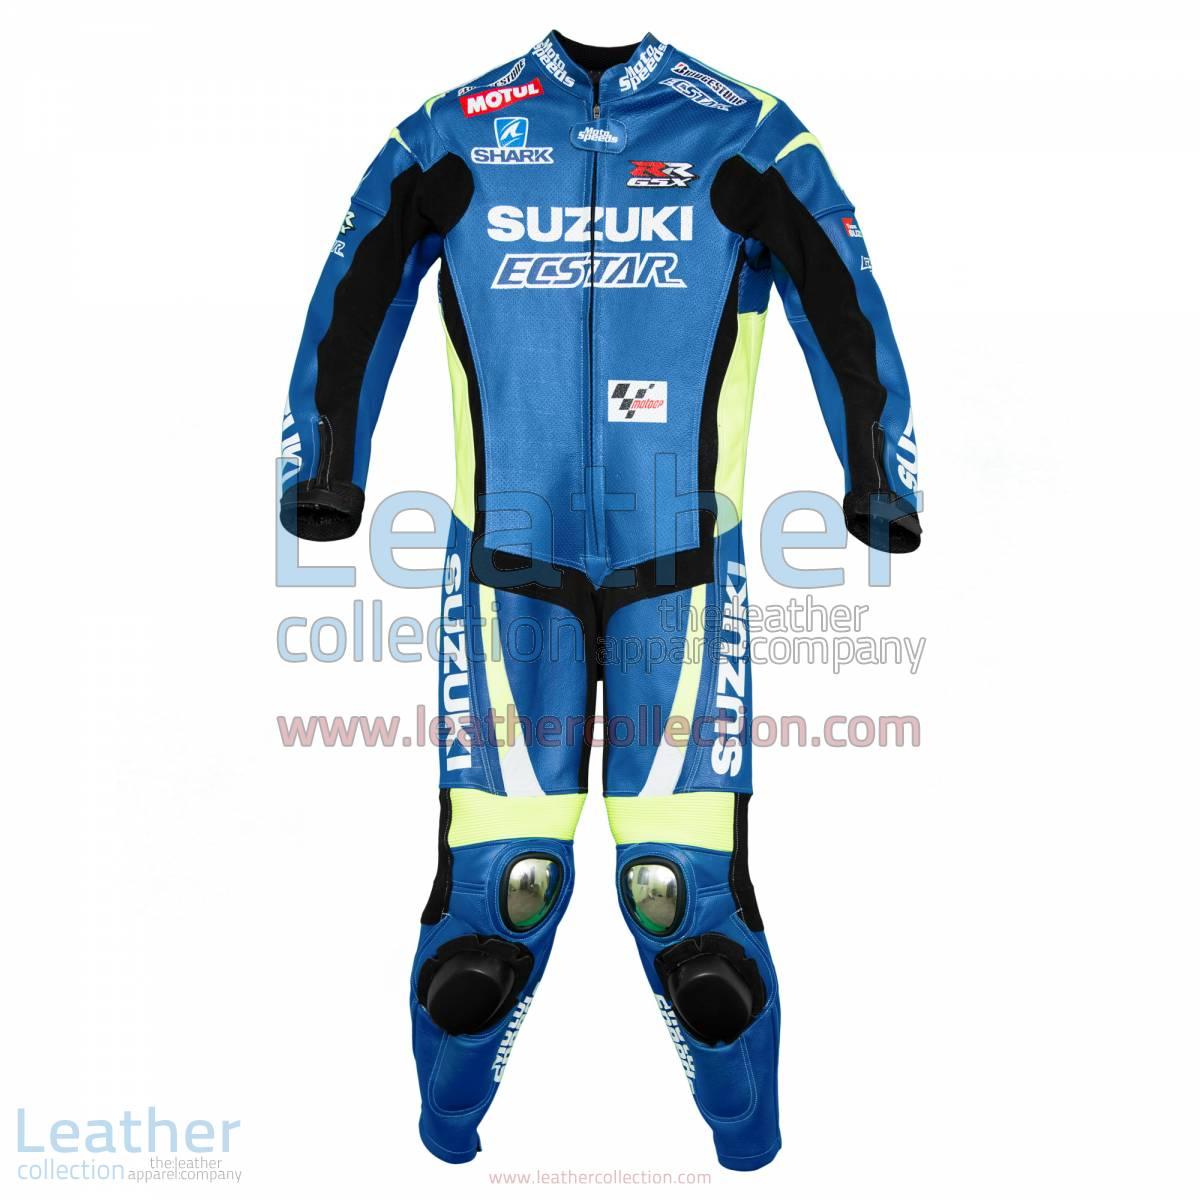 Aleix Espargaro Suzuki 2015 MotoGP Leathers | suzuki leathers